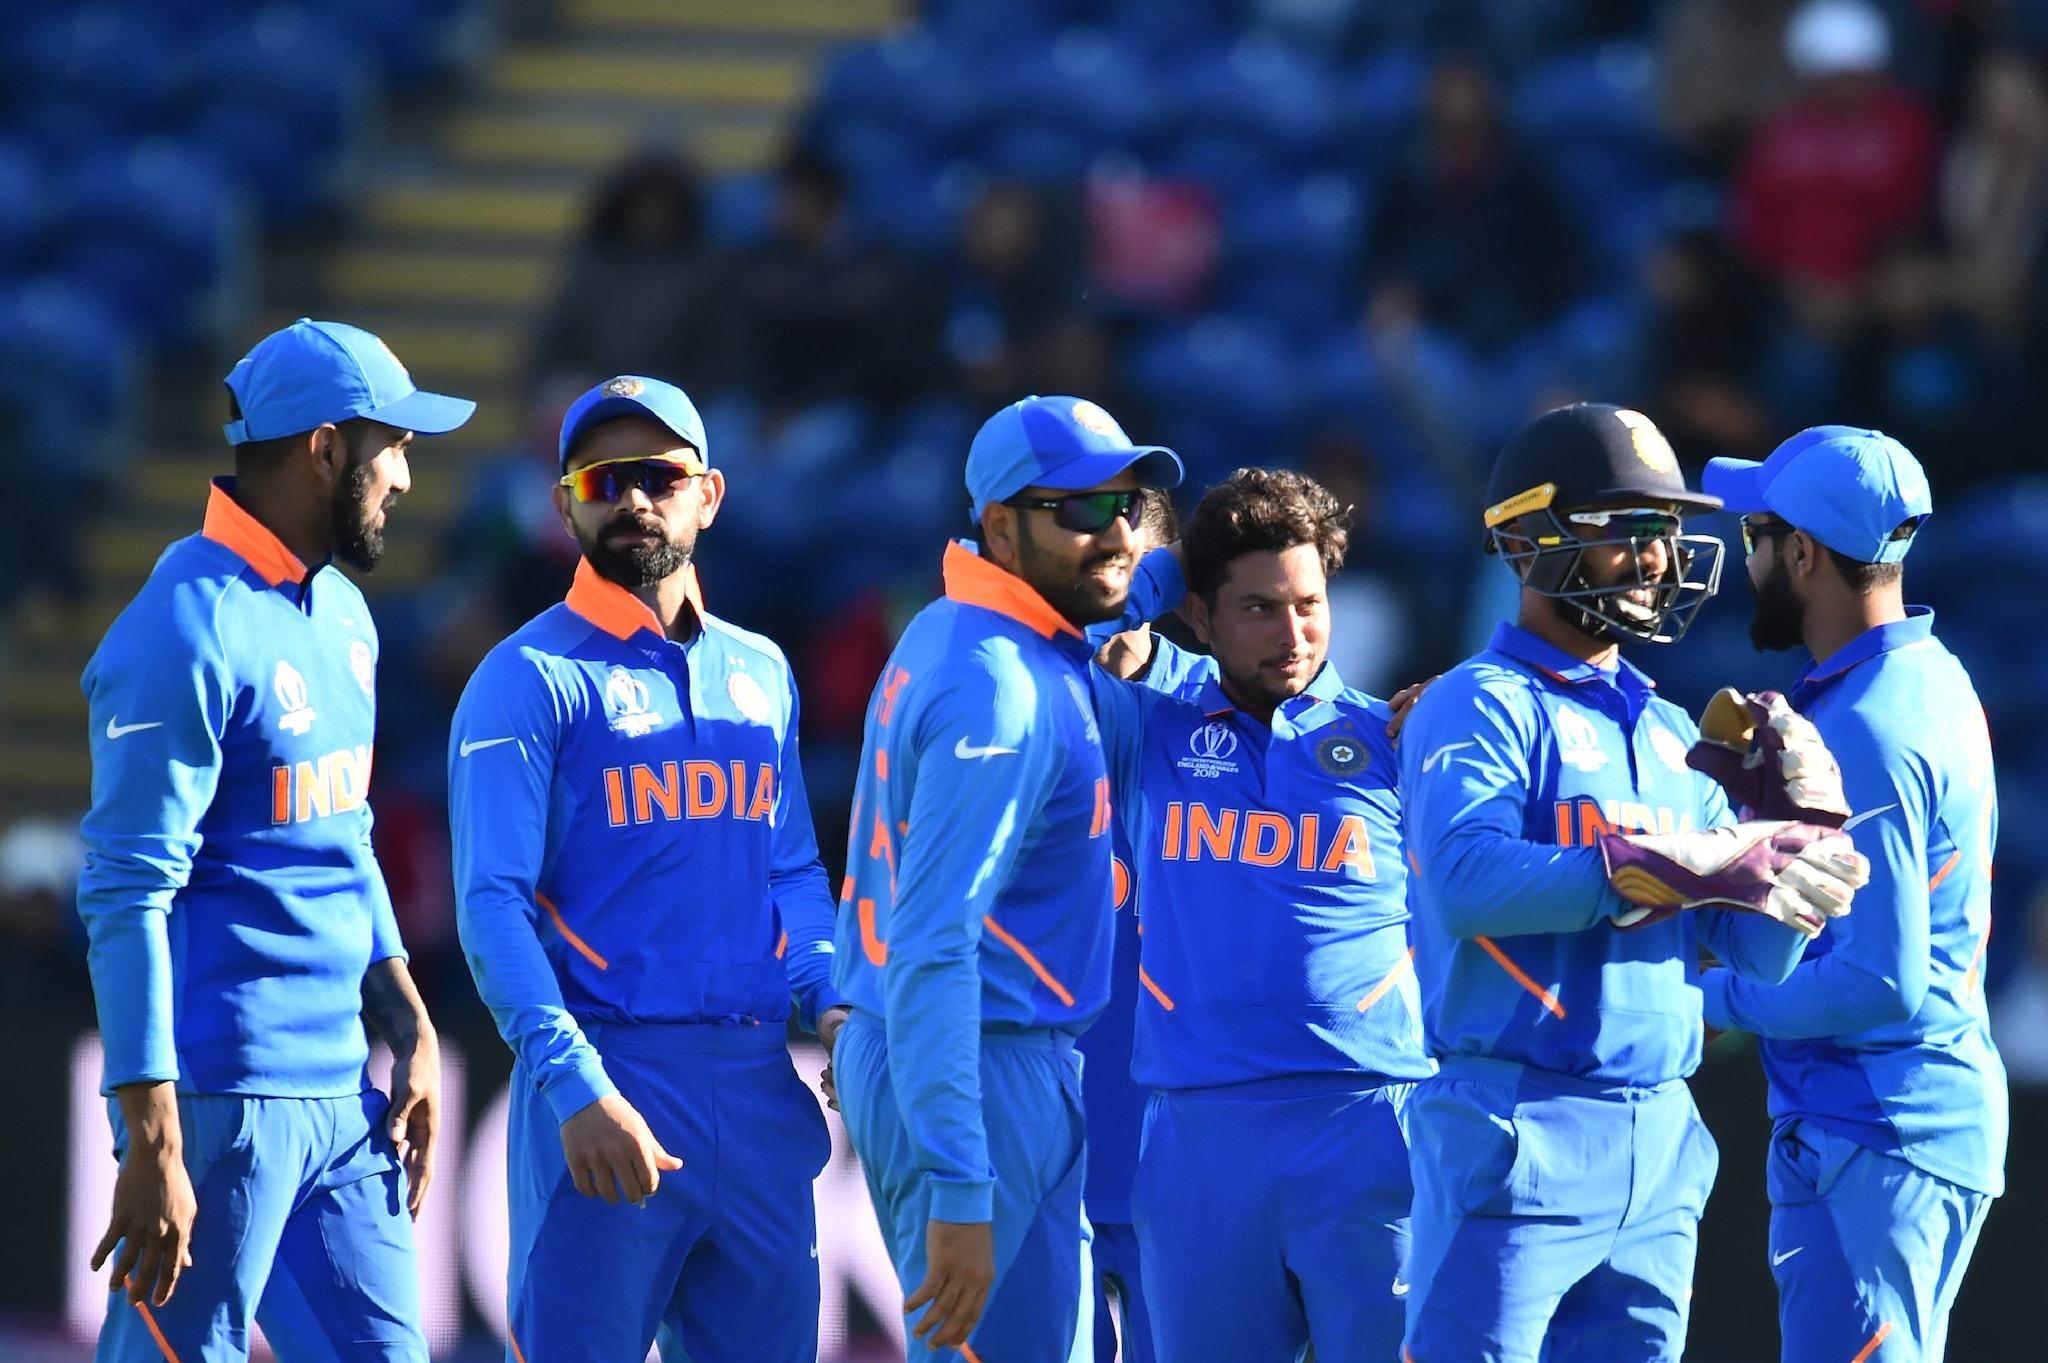 In Pics, India vs Bangladesh Warm-up Match at Cardiff